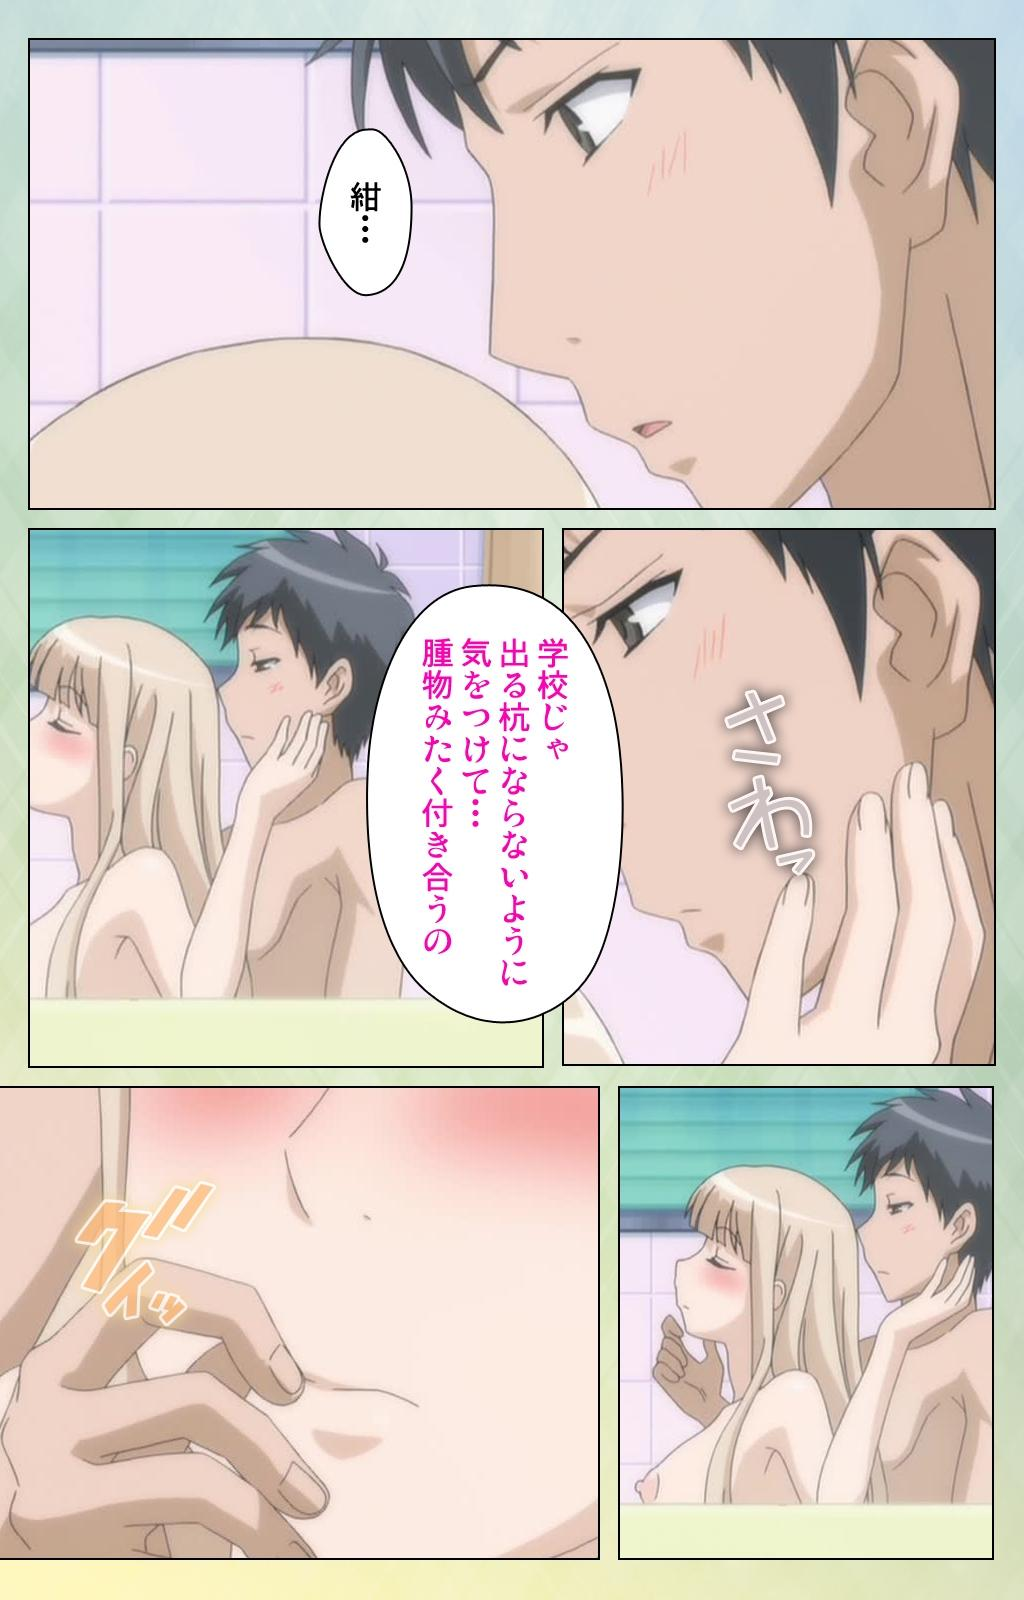 Furueru Kuchibiru fuzzy lips0 Complete Ban 52